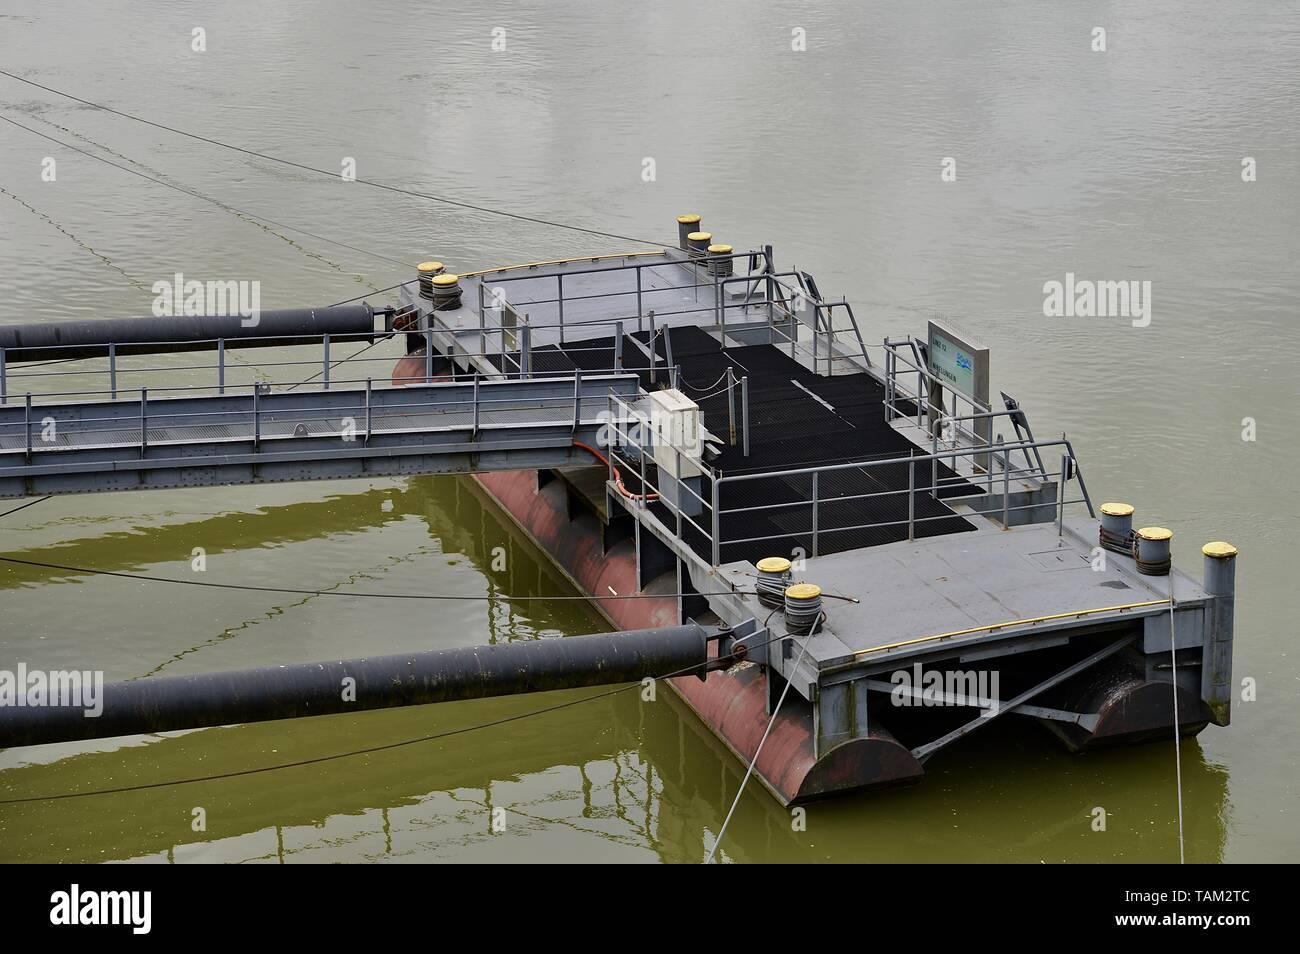 shipping pier in Linz an der Donau, Austria - Stock Image